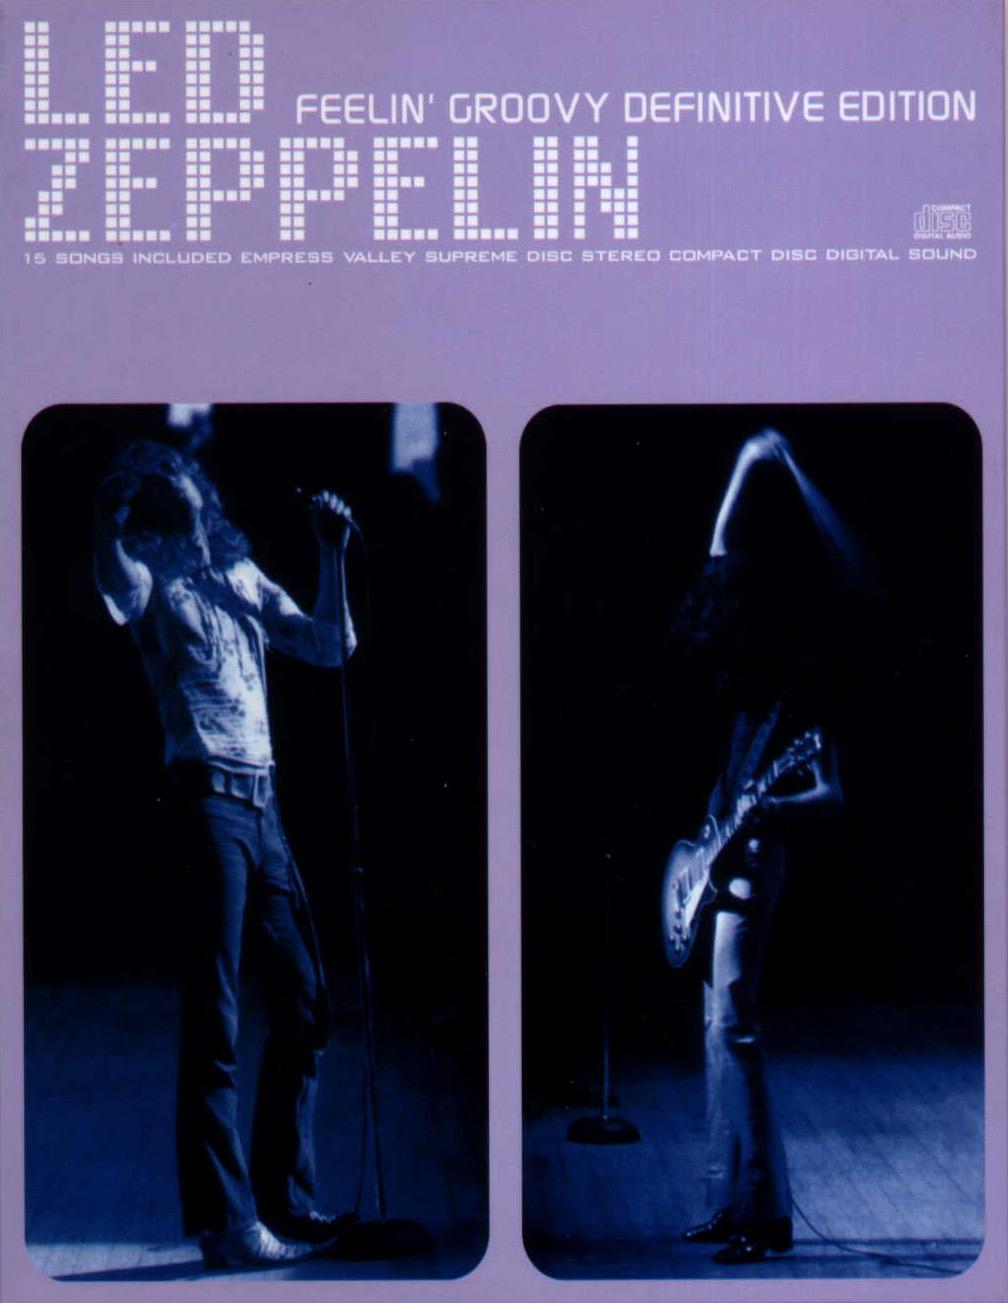 Led Zeppelin - 1971-11-16 - Ipswich (EVSD - Complete Show